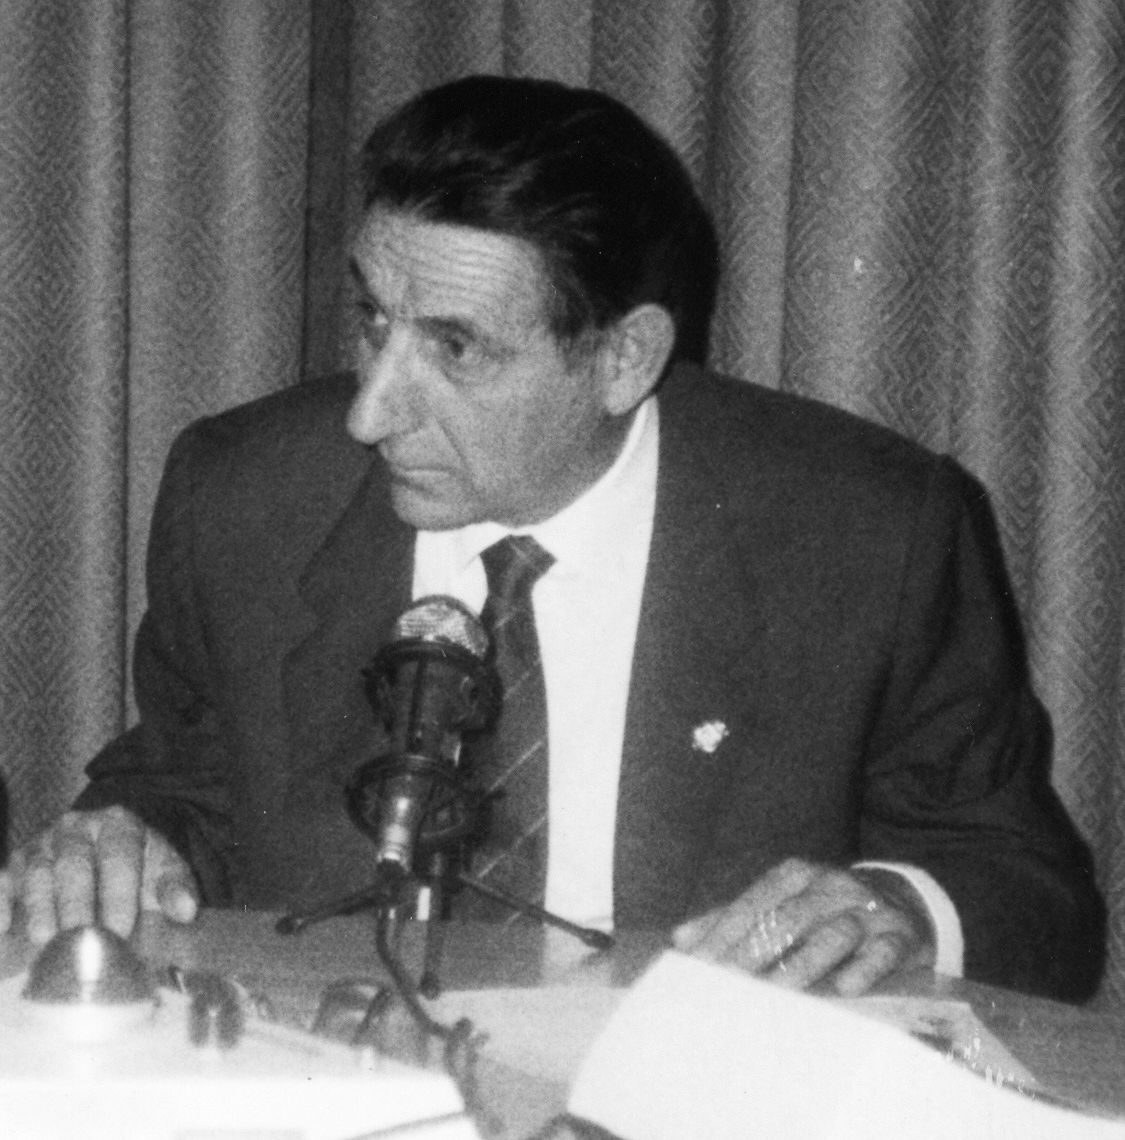 Fallece Miguel Ángel Fran, exalcalde de Binéfar